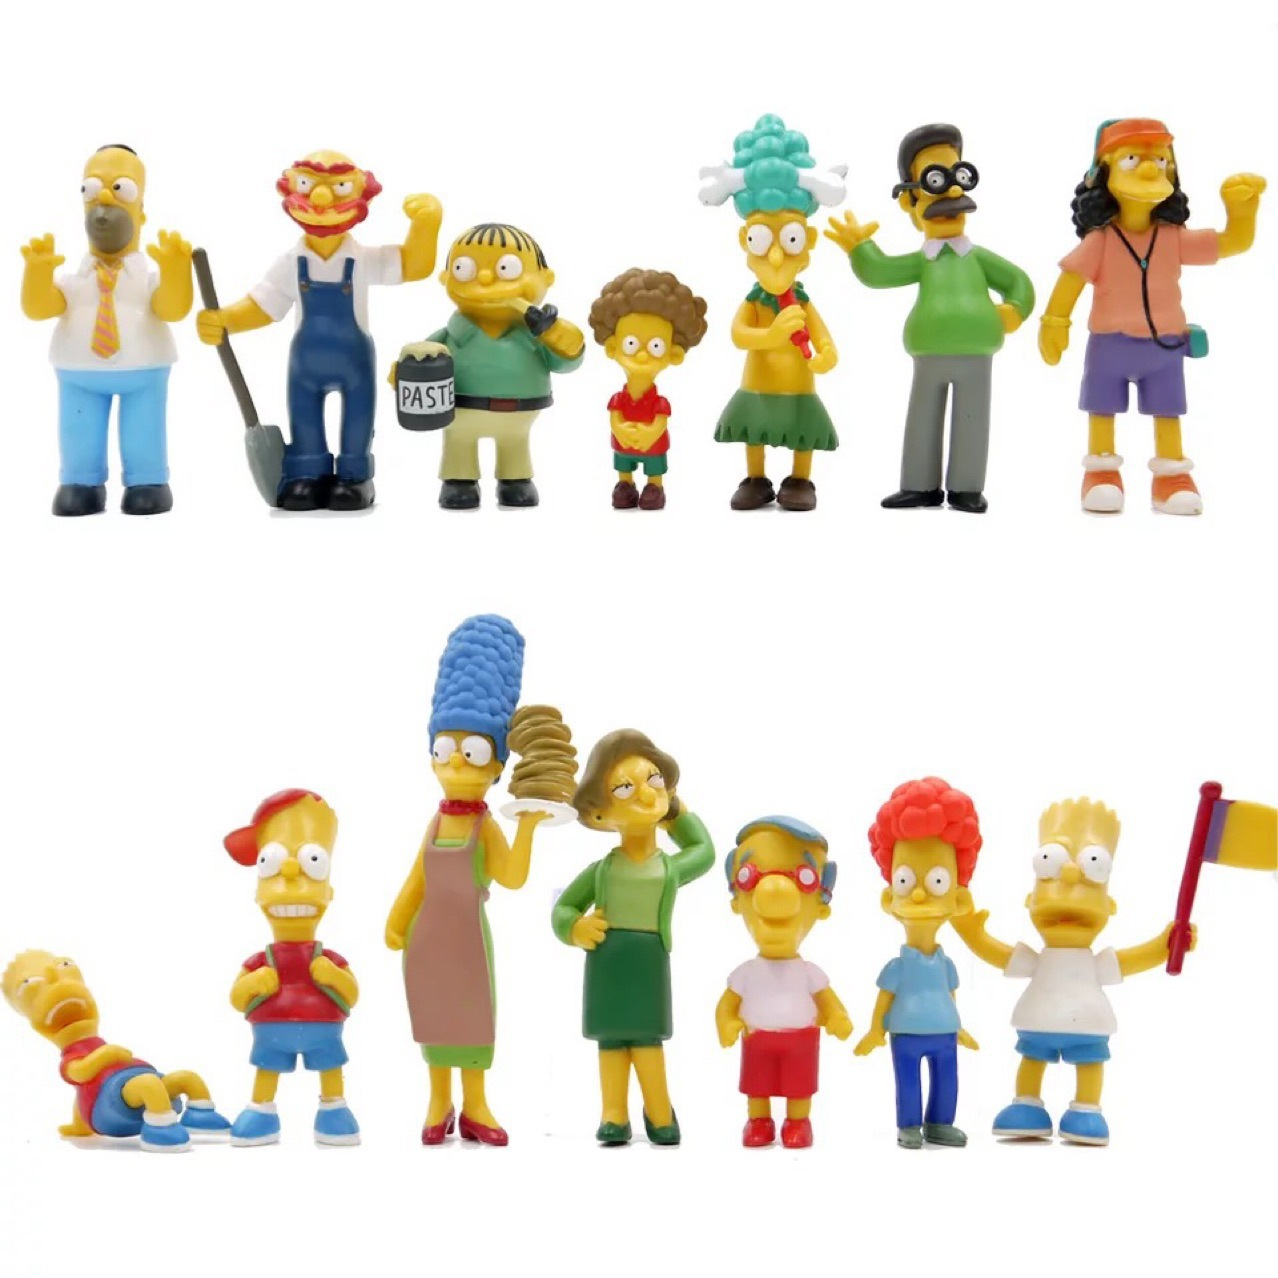 14pcs/set Simpsons Cartoon The Arsene Family Cake Decoration Model Children's Toys